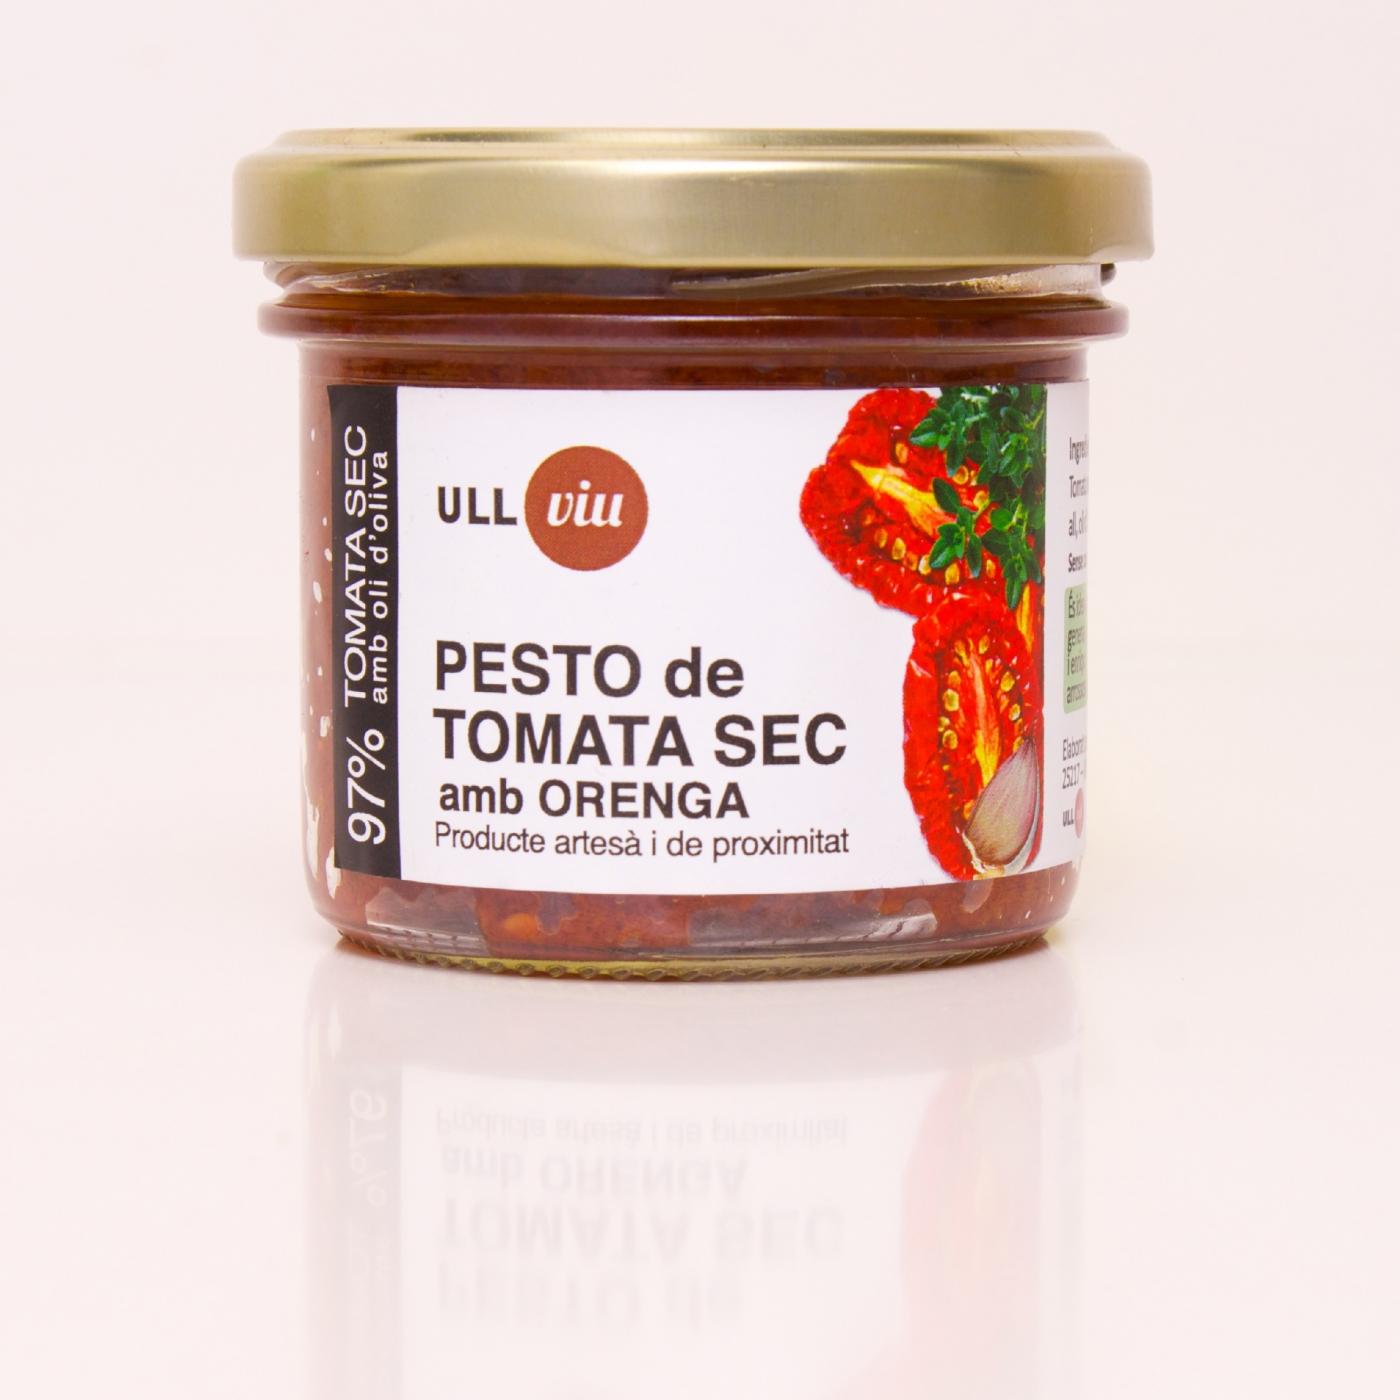 Pesto de tomata sec amb orenga 110 grams -